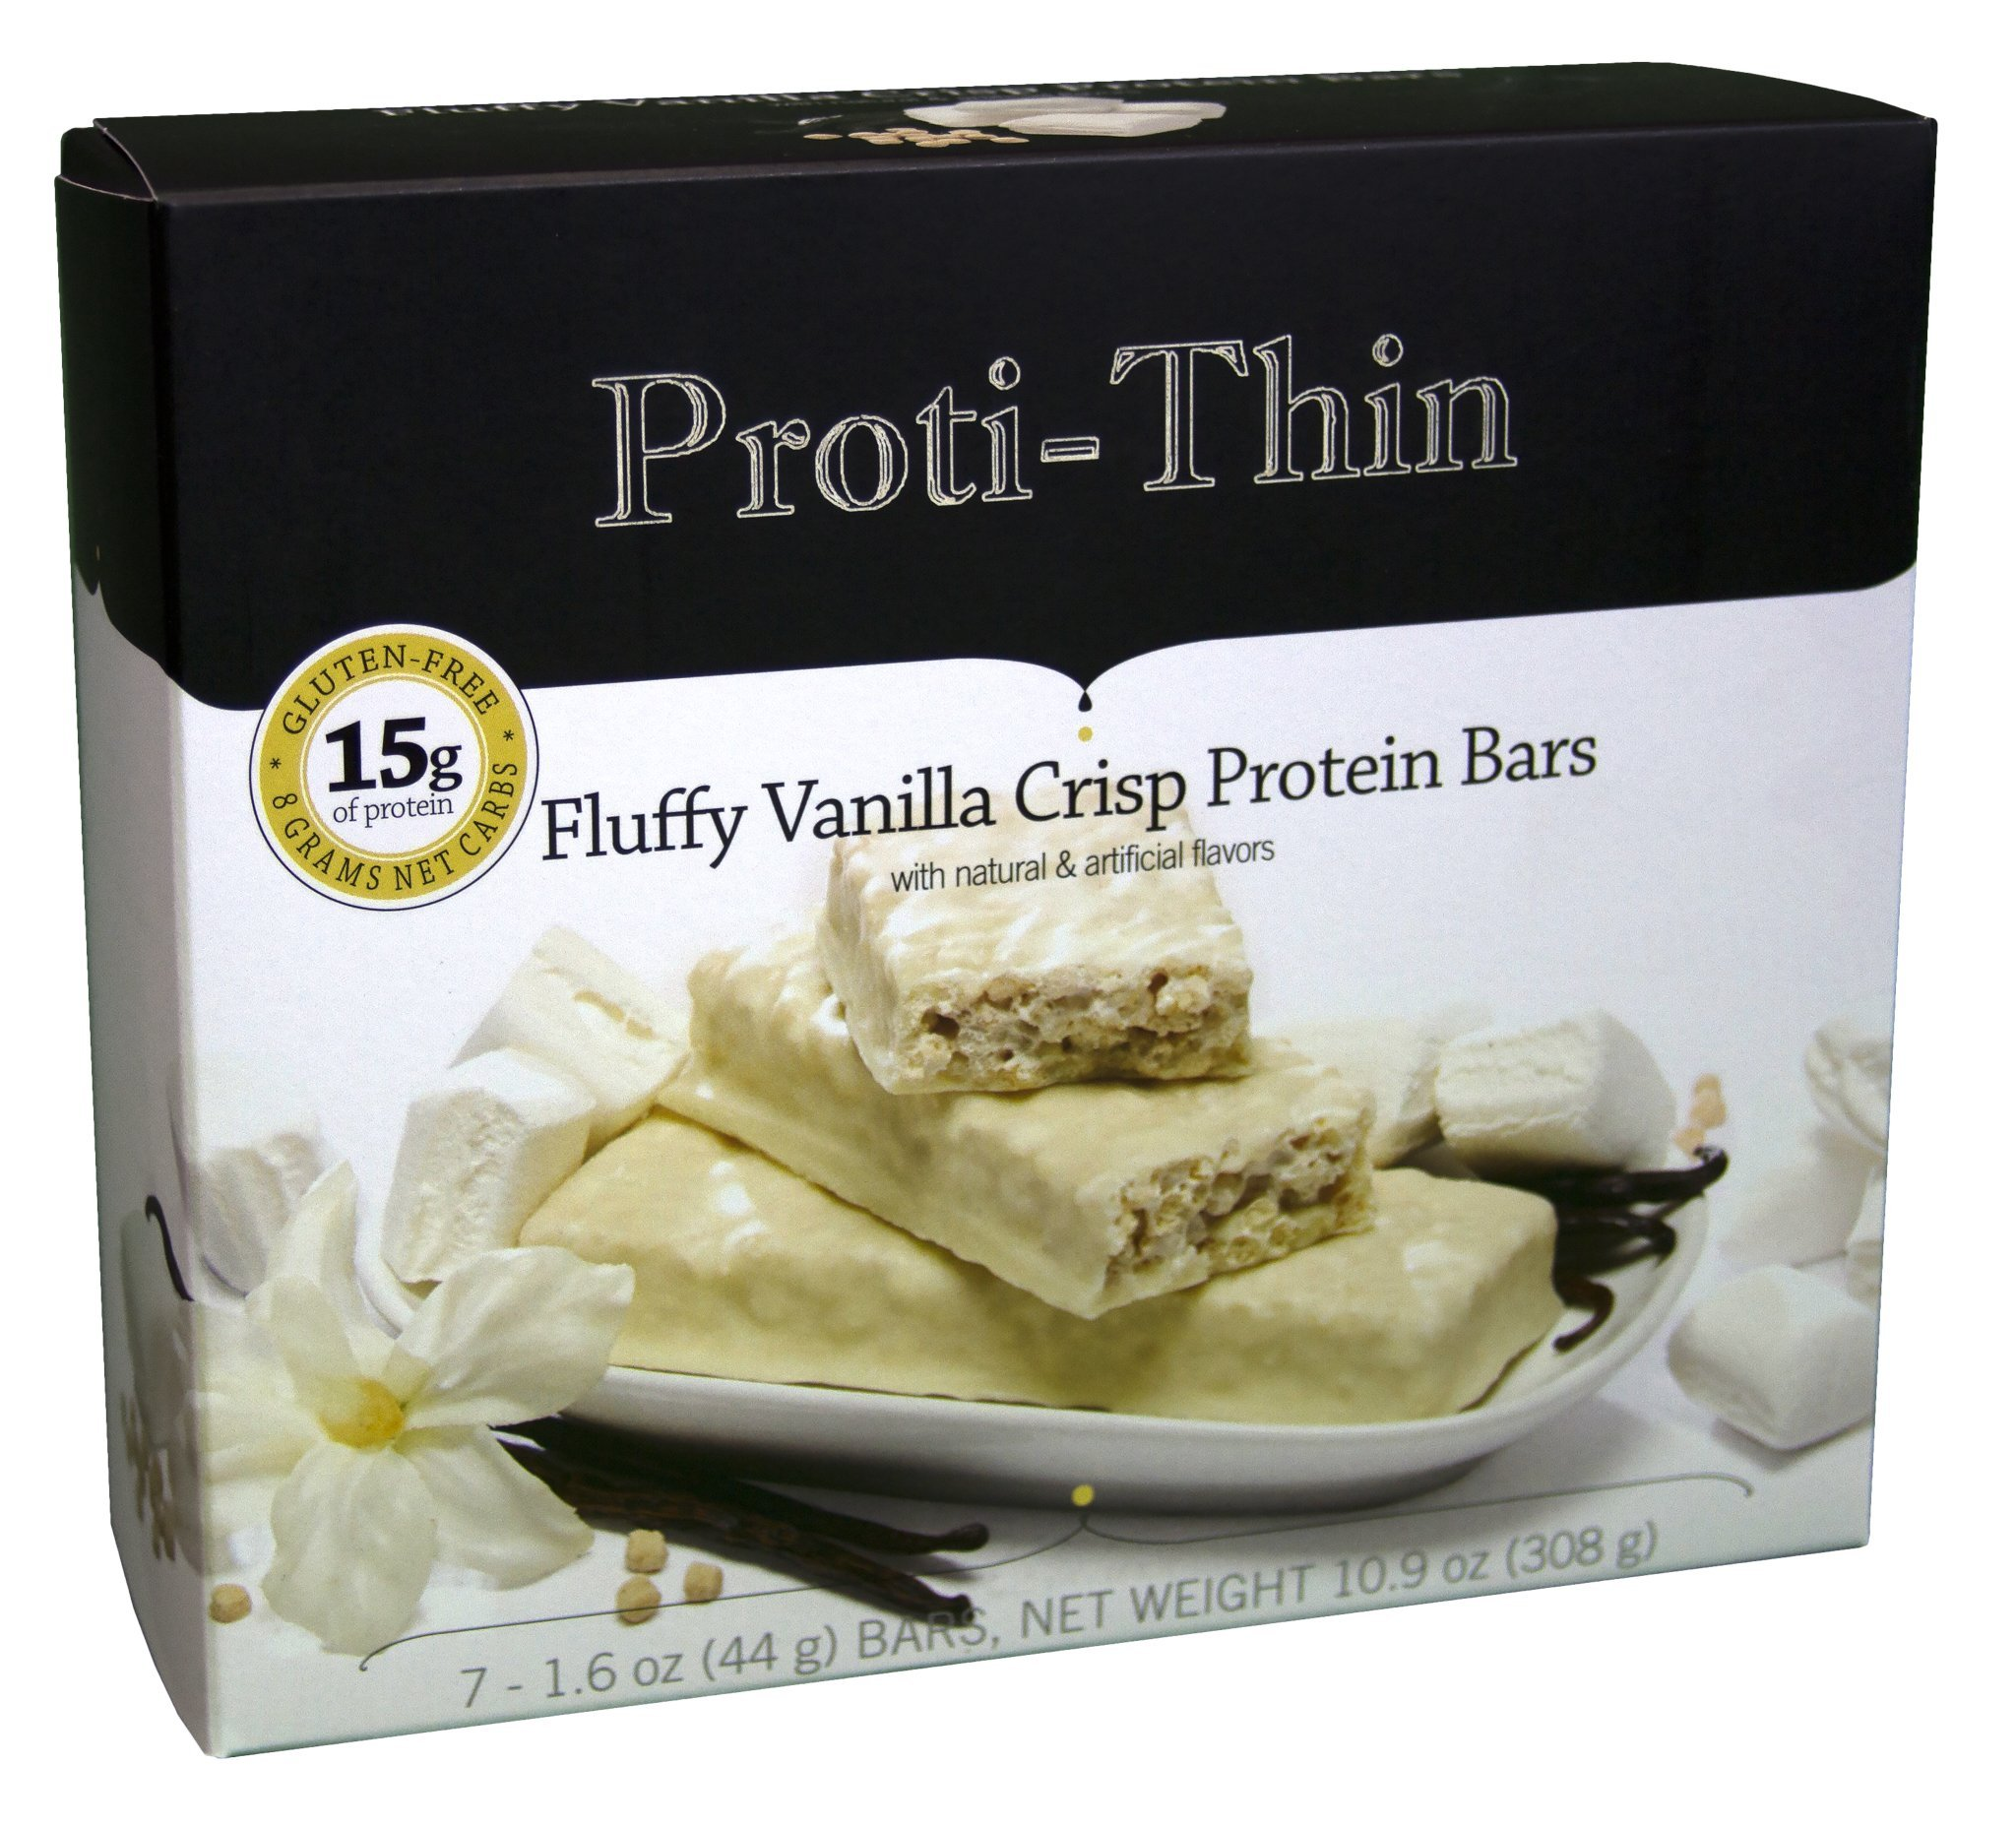 Proti-Thin - Fluffy Vanilla Crisp - Protein Bar - Ideal Protein Compatible - 15g Protein - Low Carb Diet Bar - High Fiber Snack Bar - Gluten Free (7/Box)